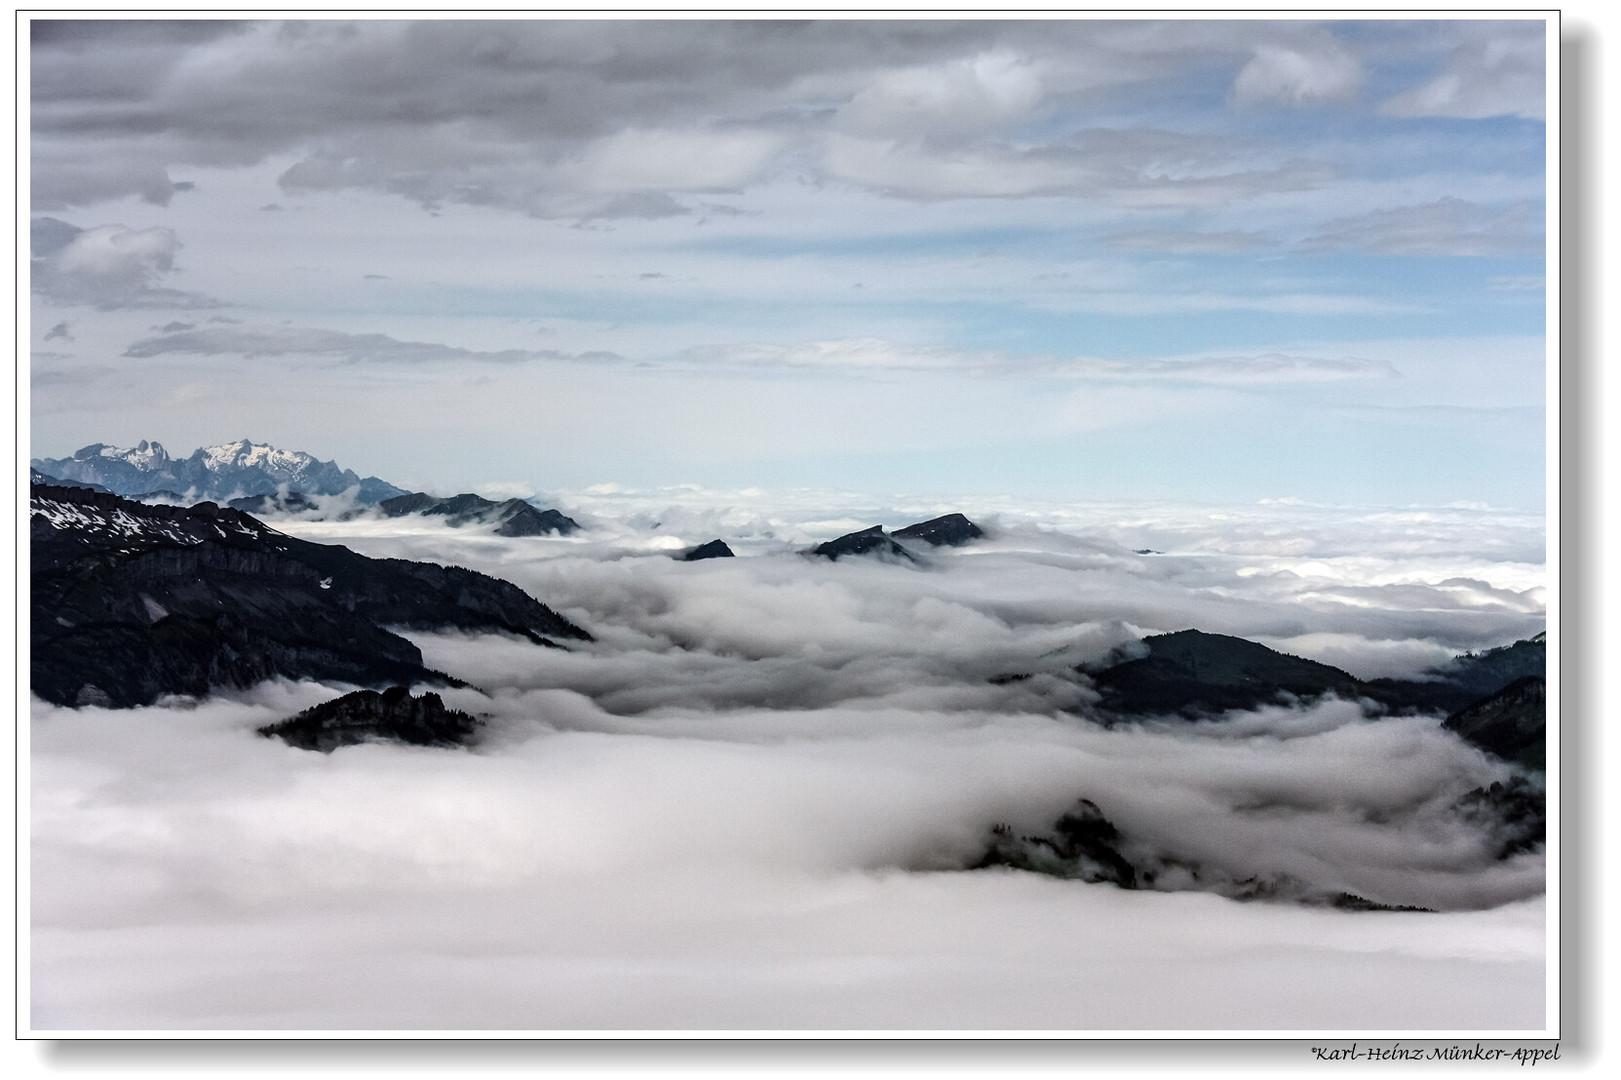 Nebelhorn _ Über den Wolken